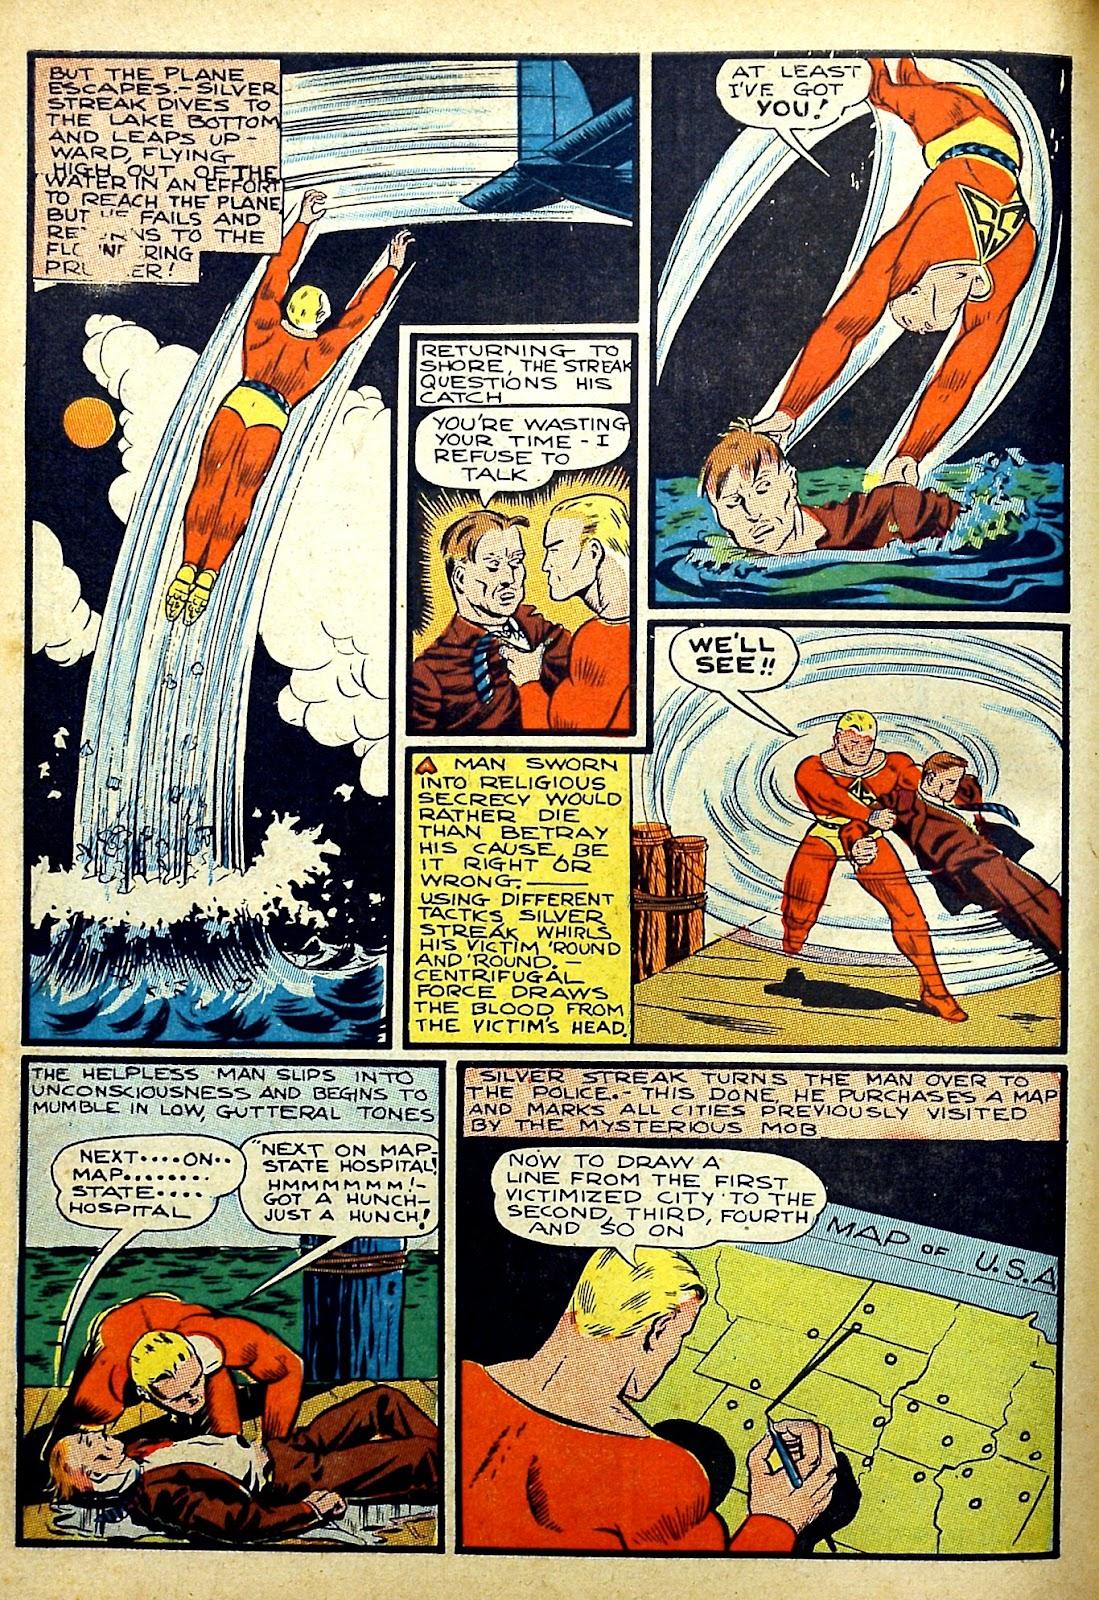 Read online Silver Streak Comics comic -  Issue #22 - 18